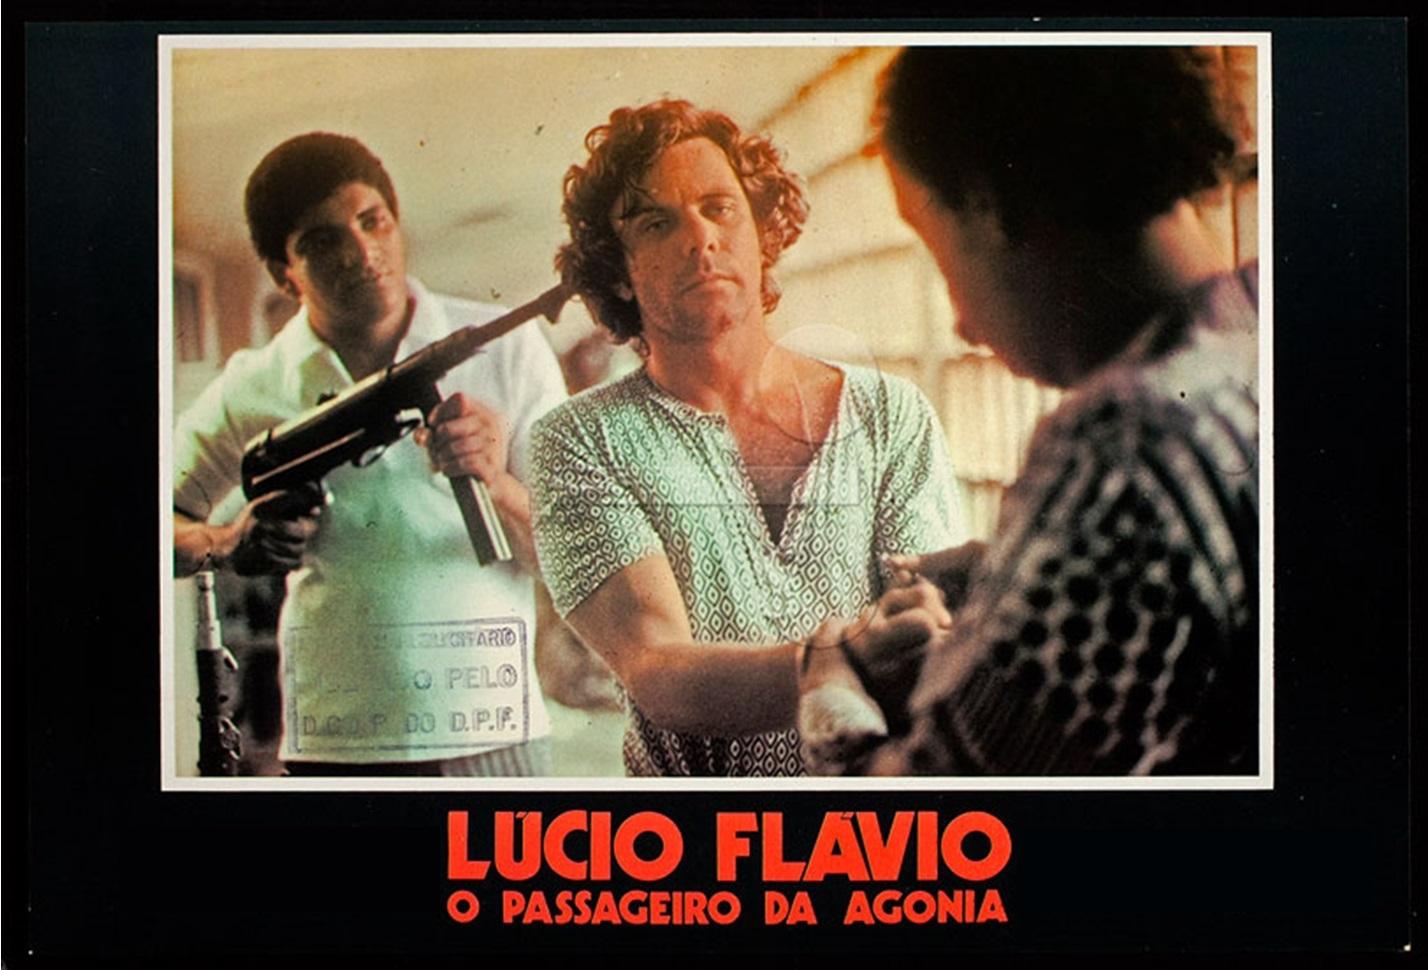 DA FILME AGONIA BAIXAR O PASSAGEIRO LUCIO FLAVIO